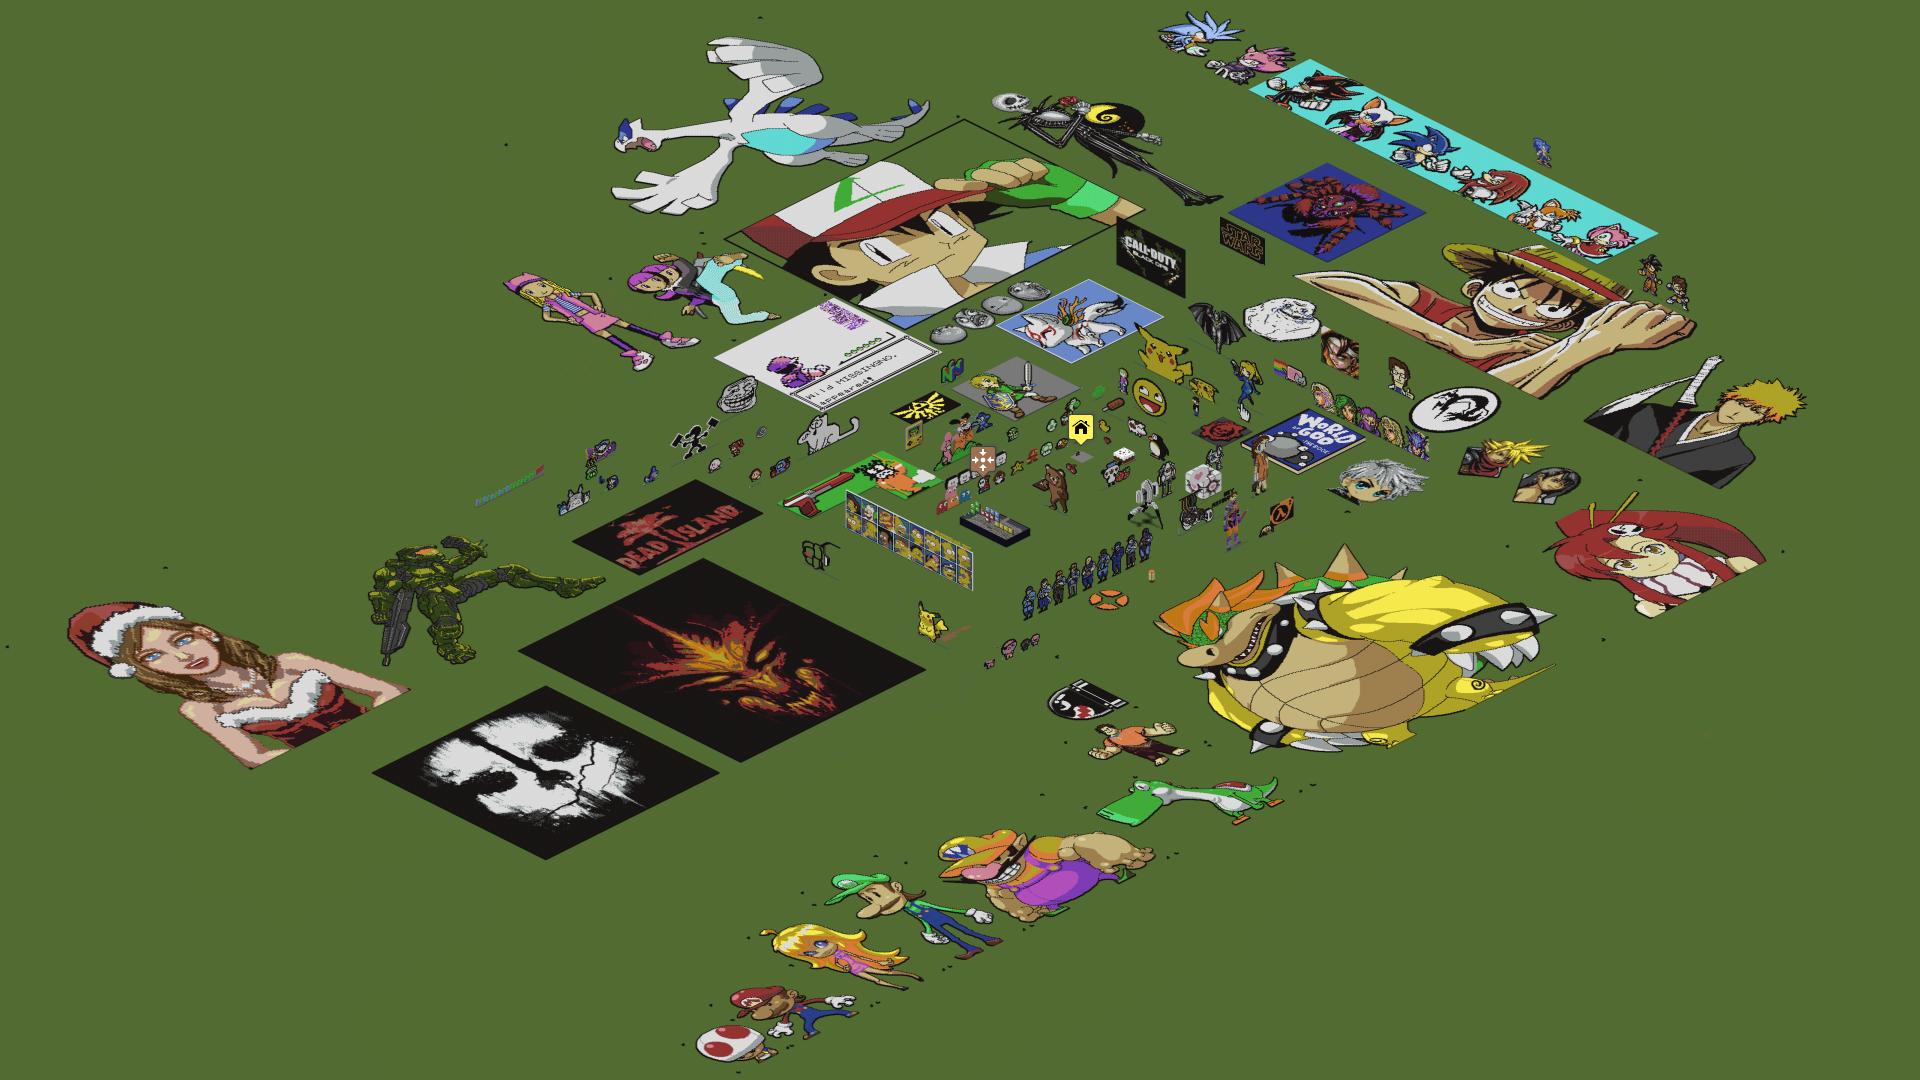 Drawn pixel art complex World DeviantArt Art luk01 on